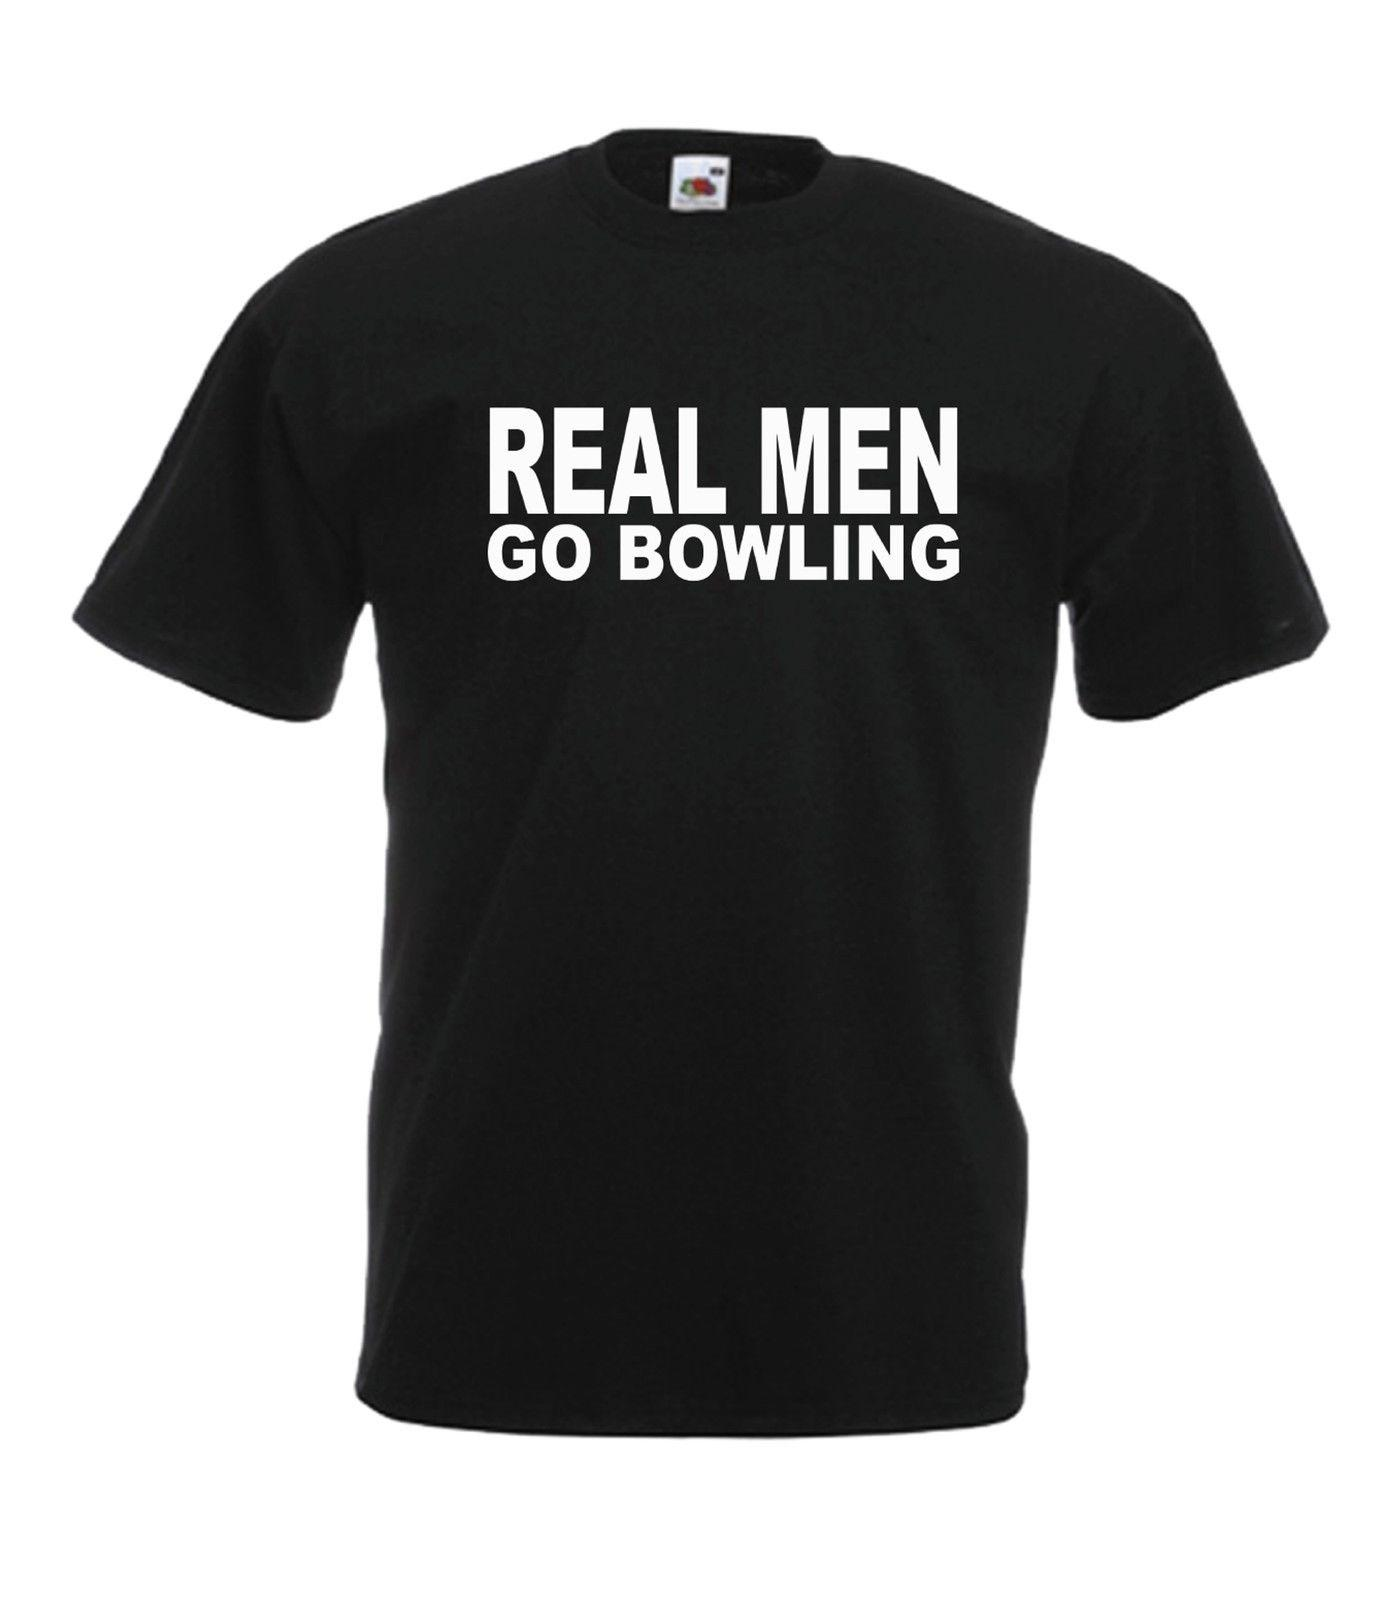 cabb464041 REAL MEN GO TEN PIN BOWLING Top Funny Xmas Birthday Gift New Mens Womens T  SHIRT Funny Unisex Casual Tshirt Gift Best T Shirt Shop Online Cool T Shirt  ...